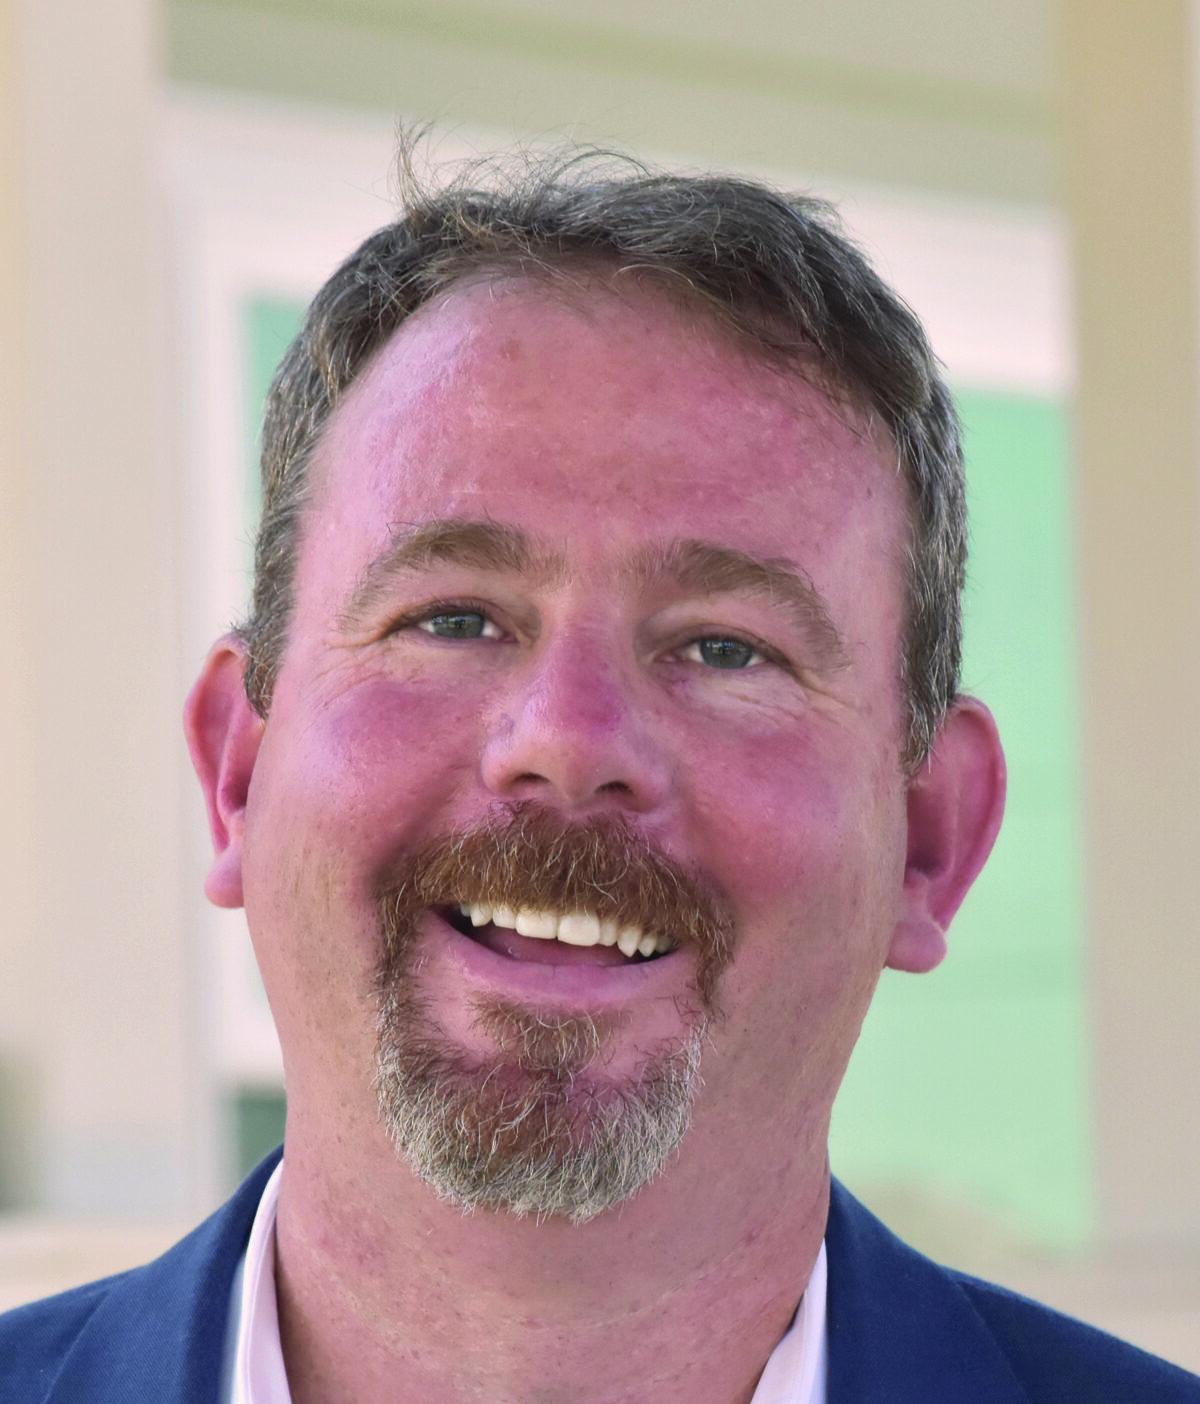 Headshot of Doug Shoemaker, Male Wearing Pink Shirt and Blue Blazer